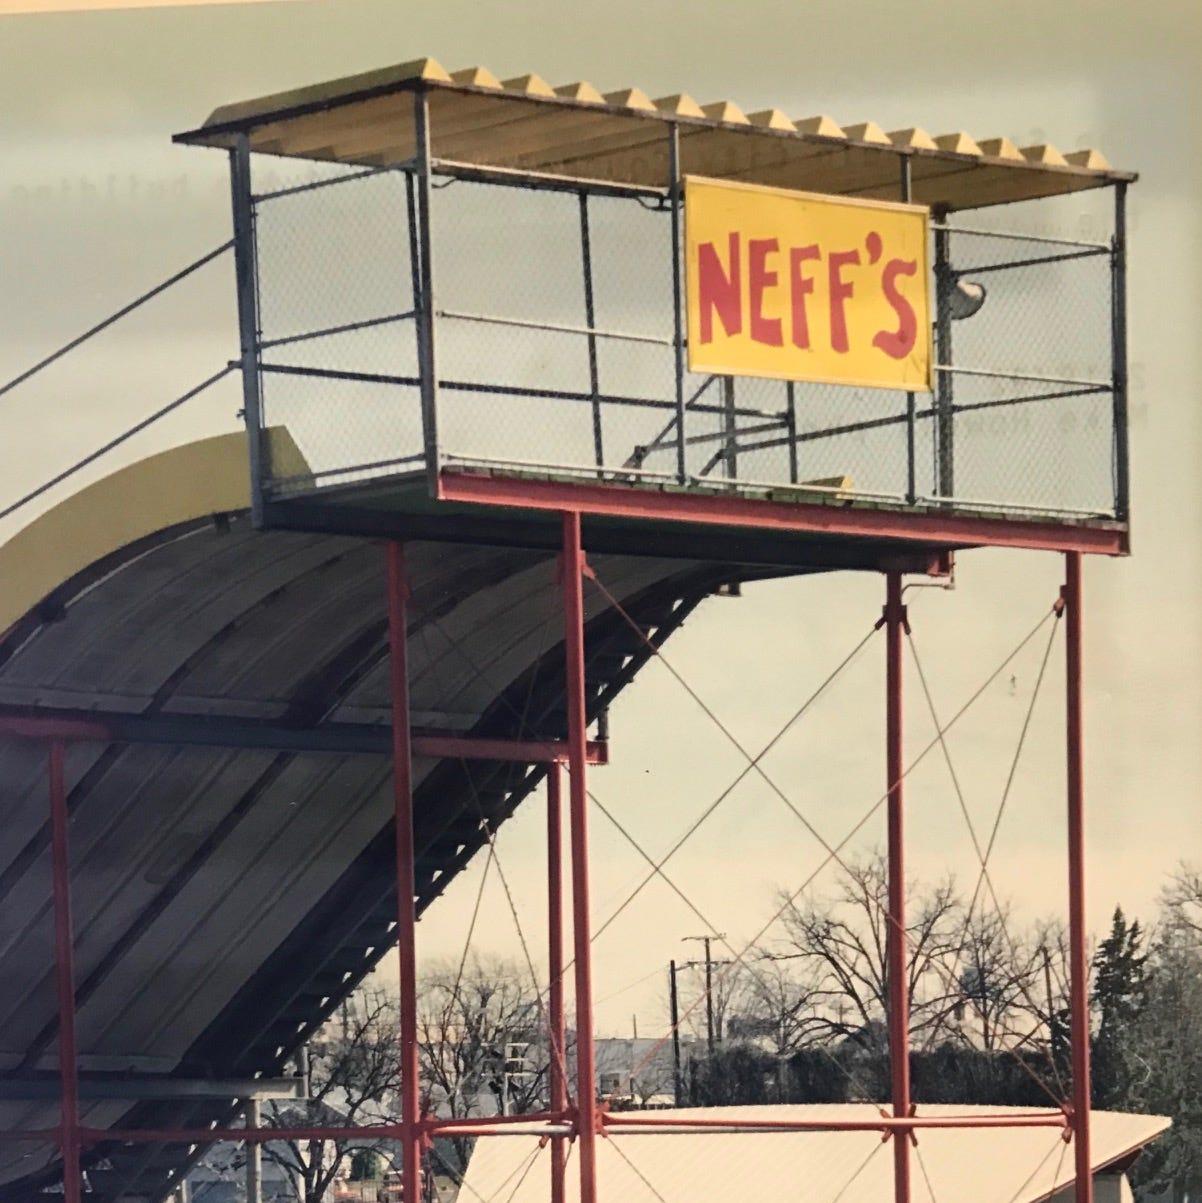 Neff's was the best little amusement park in West Texas